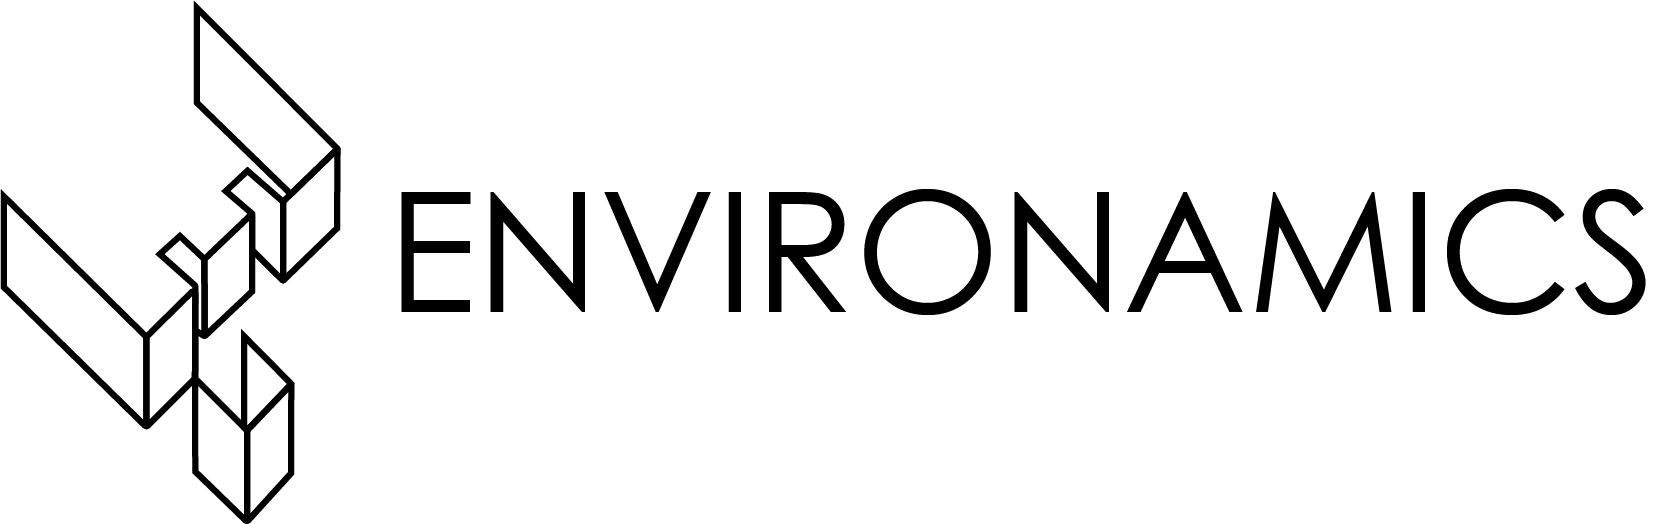 Environamics Logo Black